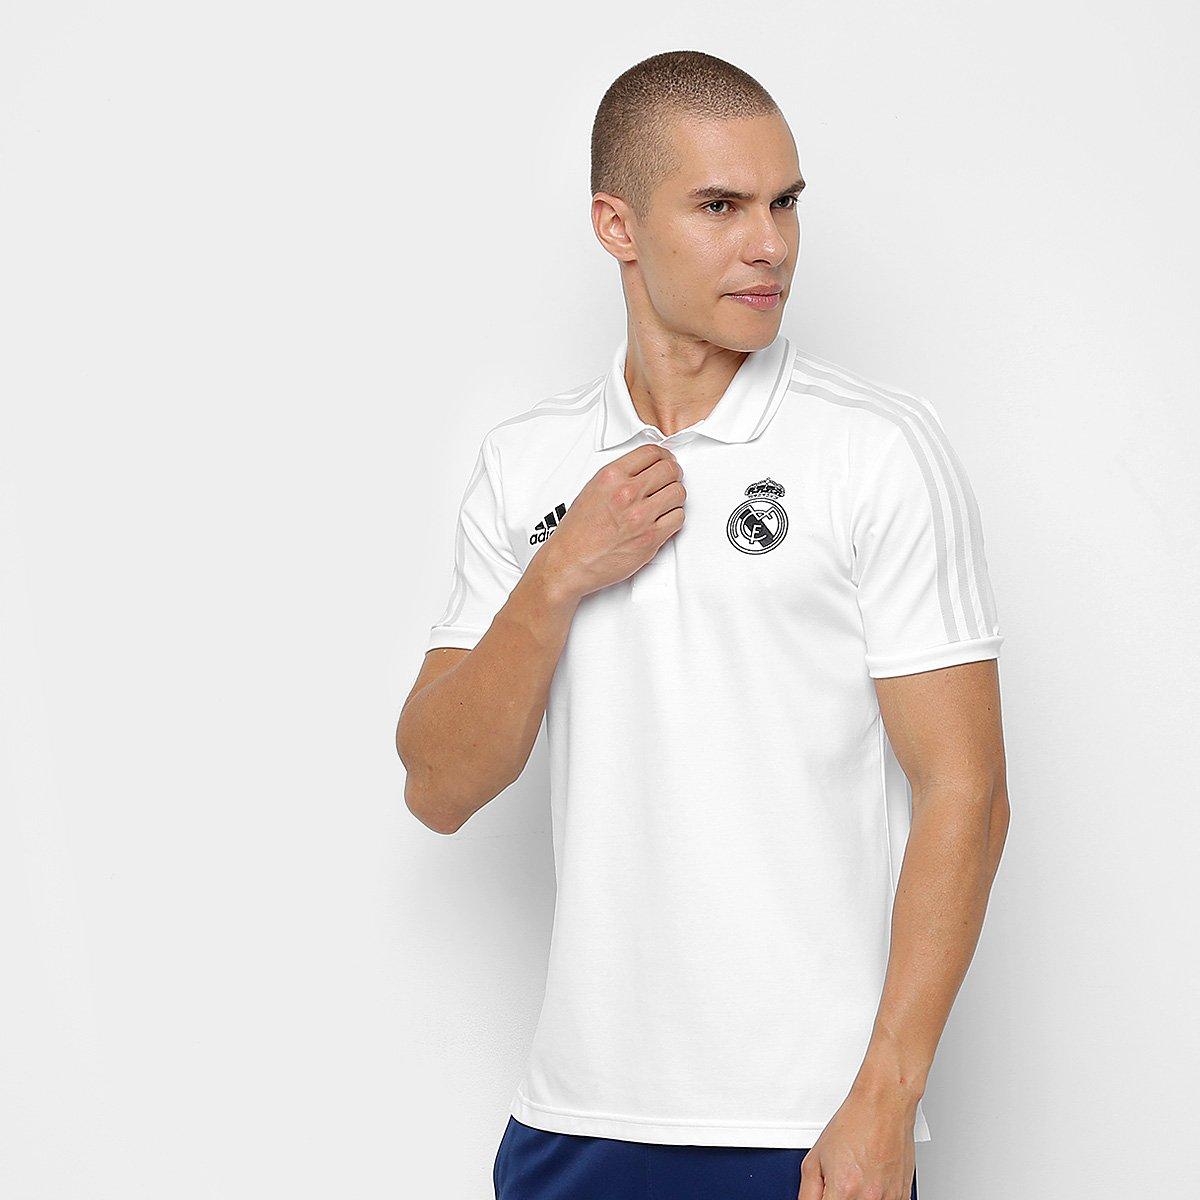 44971f75b8 Camisa Polo Real Madrid Treino Adidas Masculina